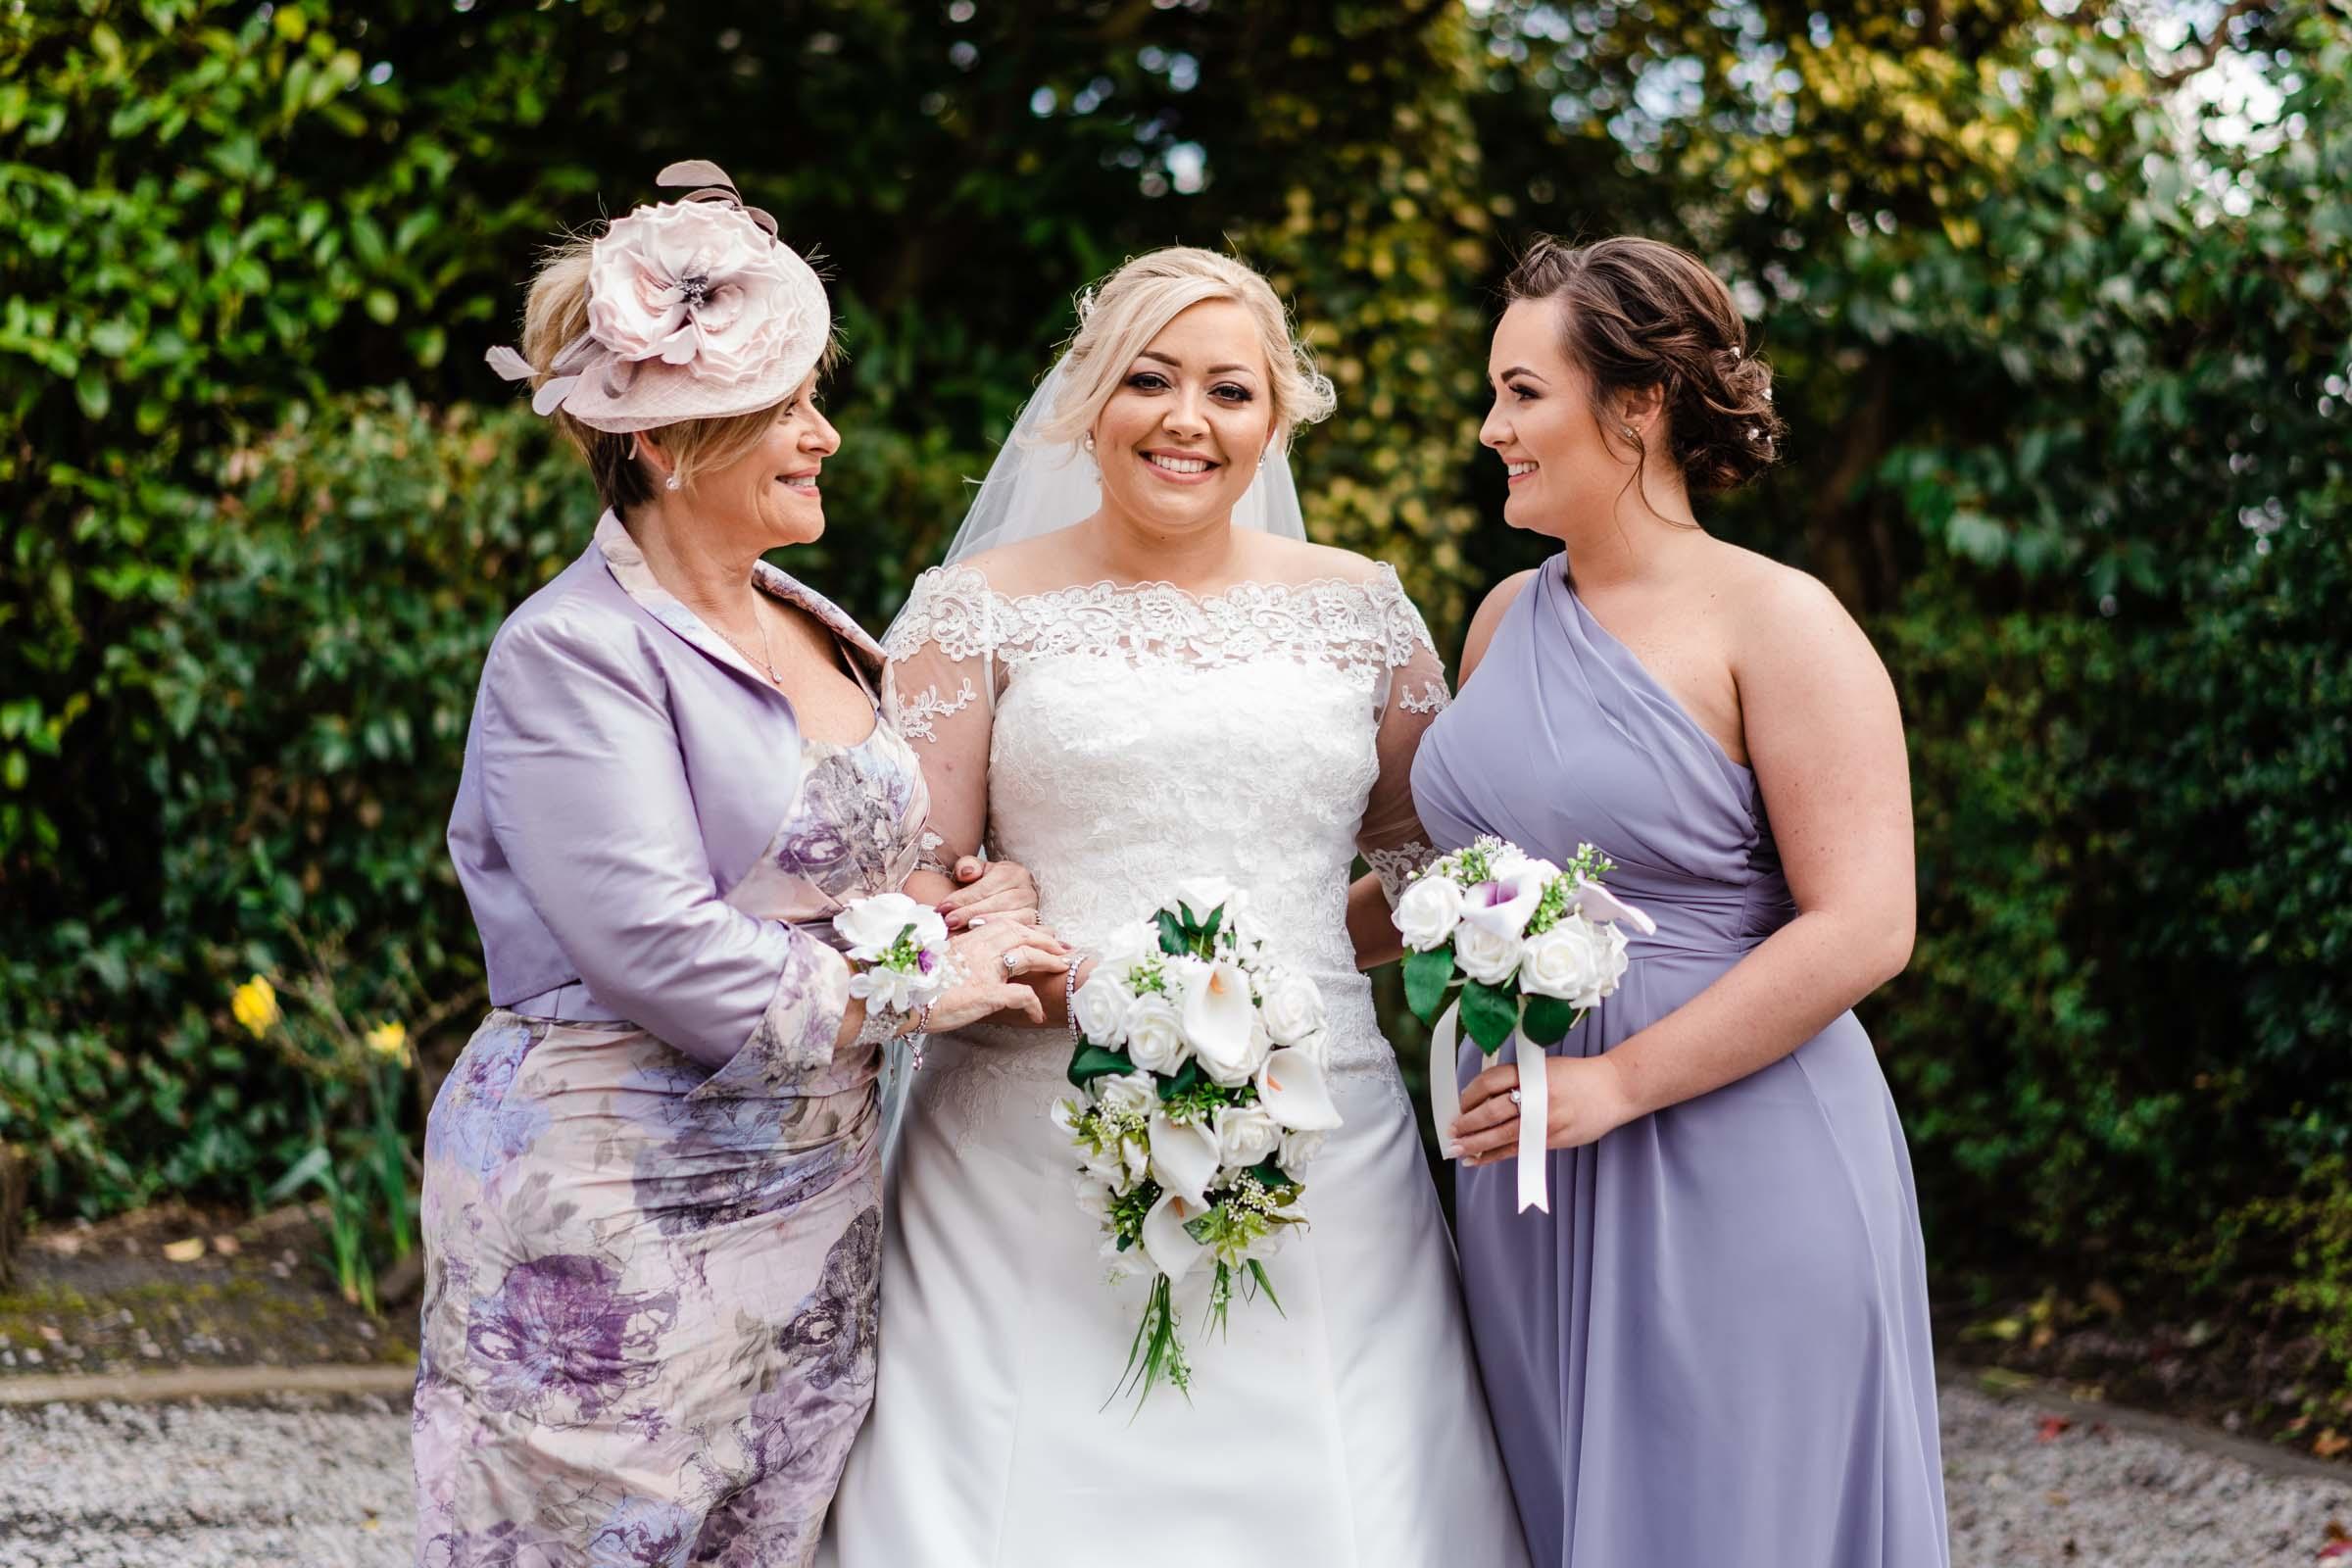 motherwell-moorings-wedding-photographer-dearlyphotography (48 of 77).jpg